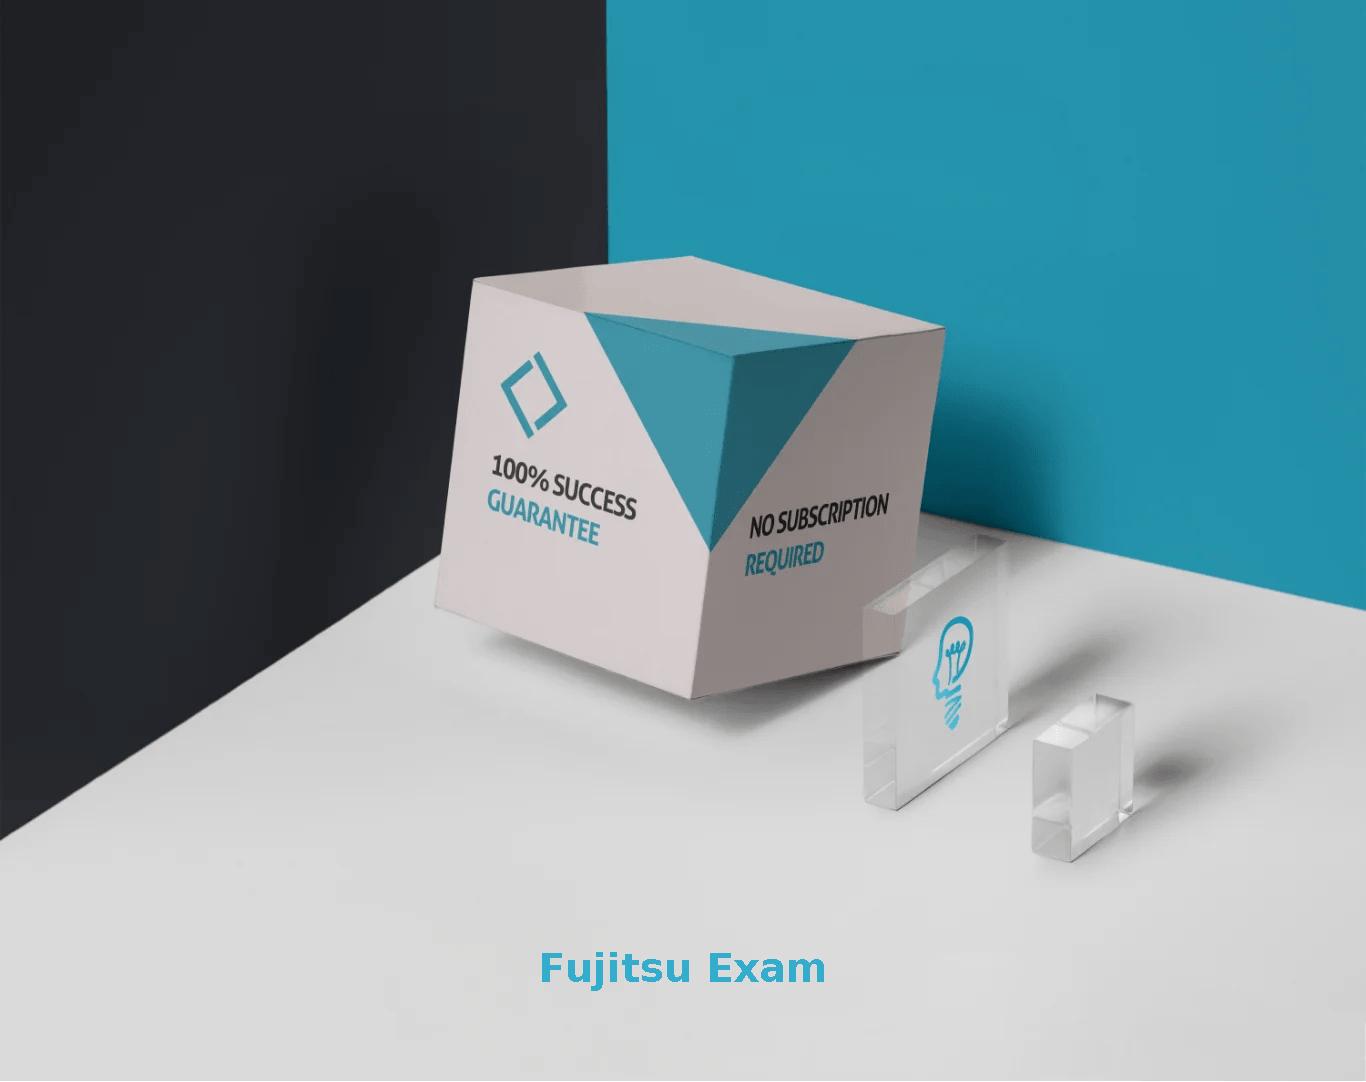 Fujitsu Exam Dumps